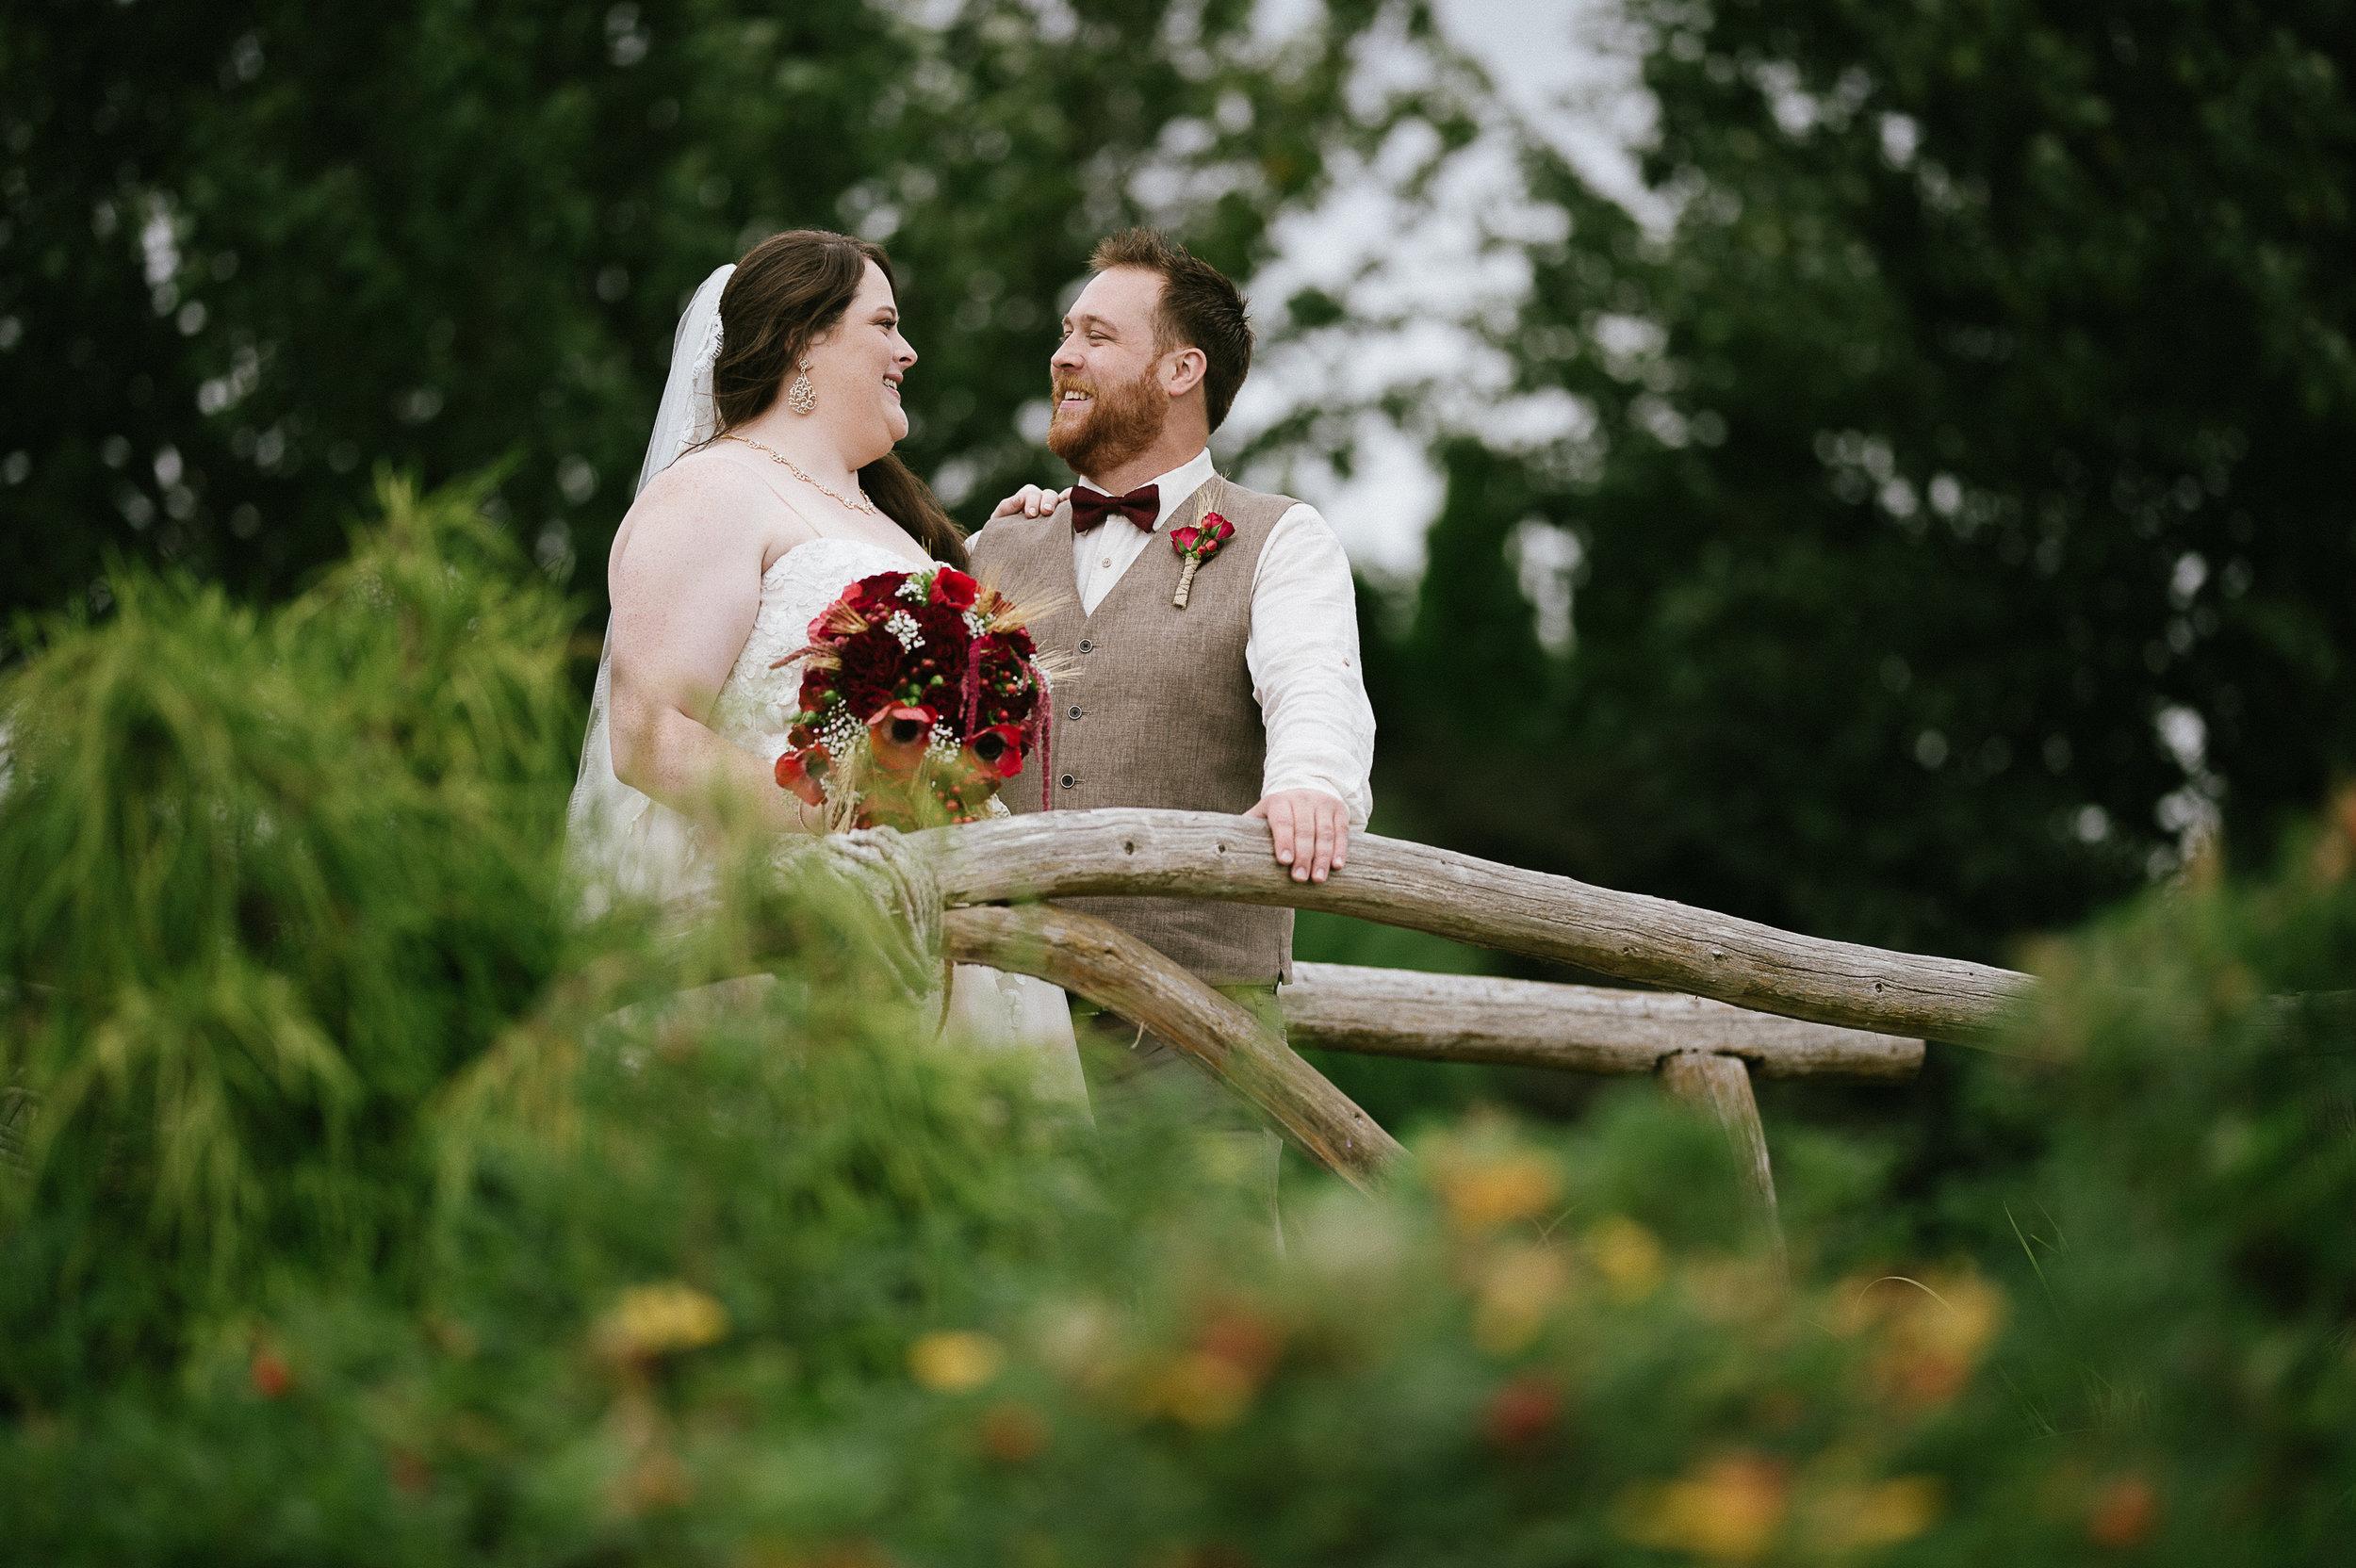 Swan Trail Farm Wedding_Sarah Schurman + Brian Skadan_Snohomish Wedding_Kelsey Lane Photography-5743.jpg